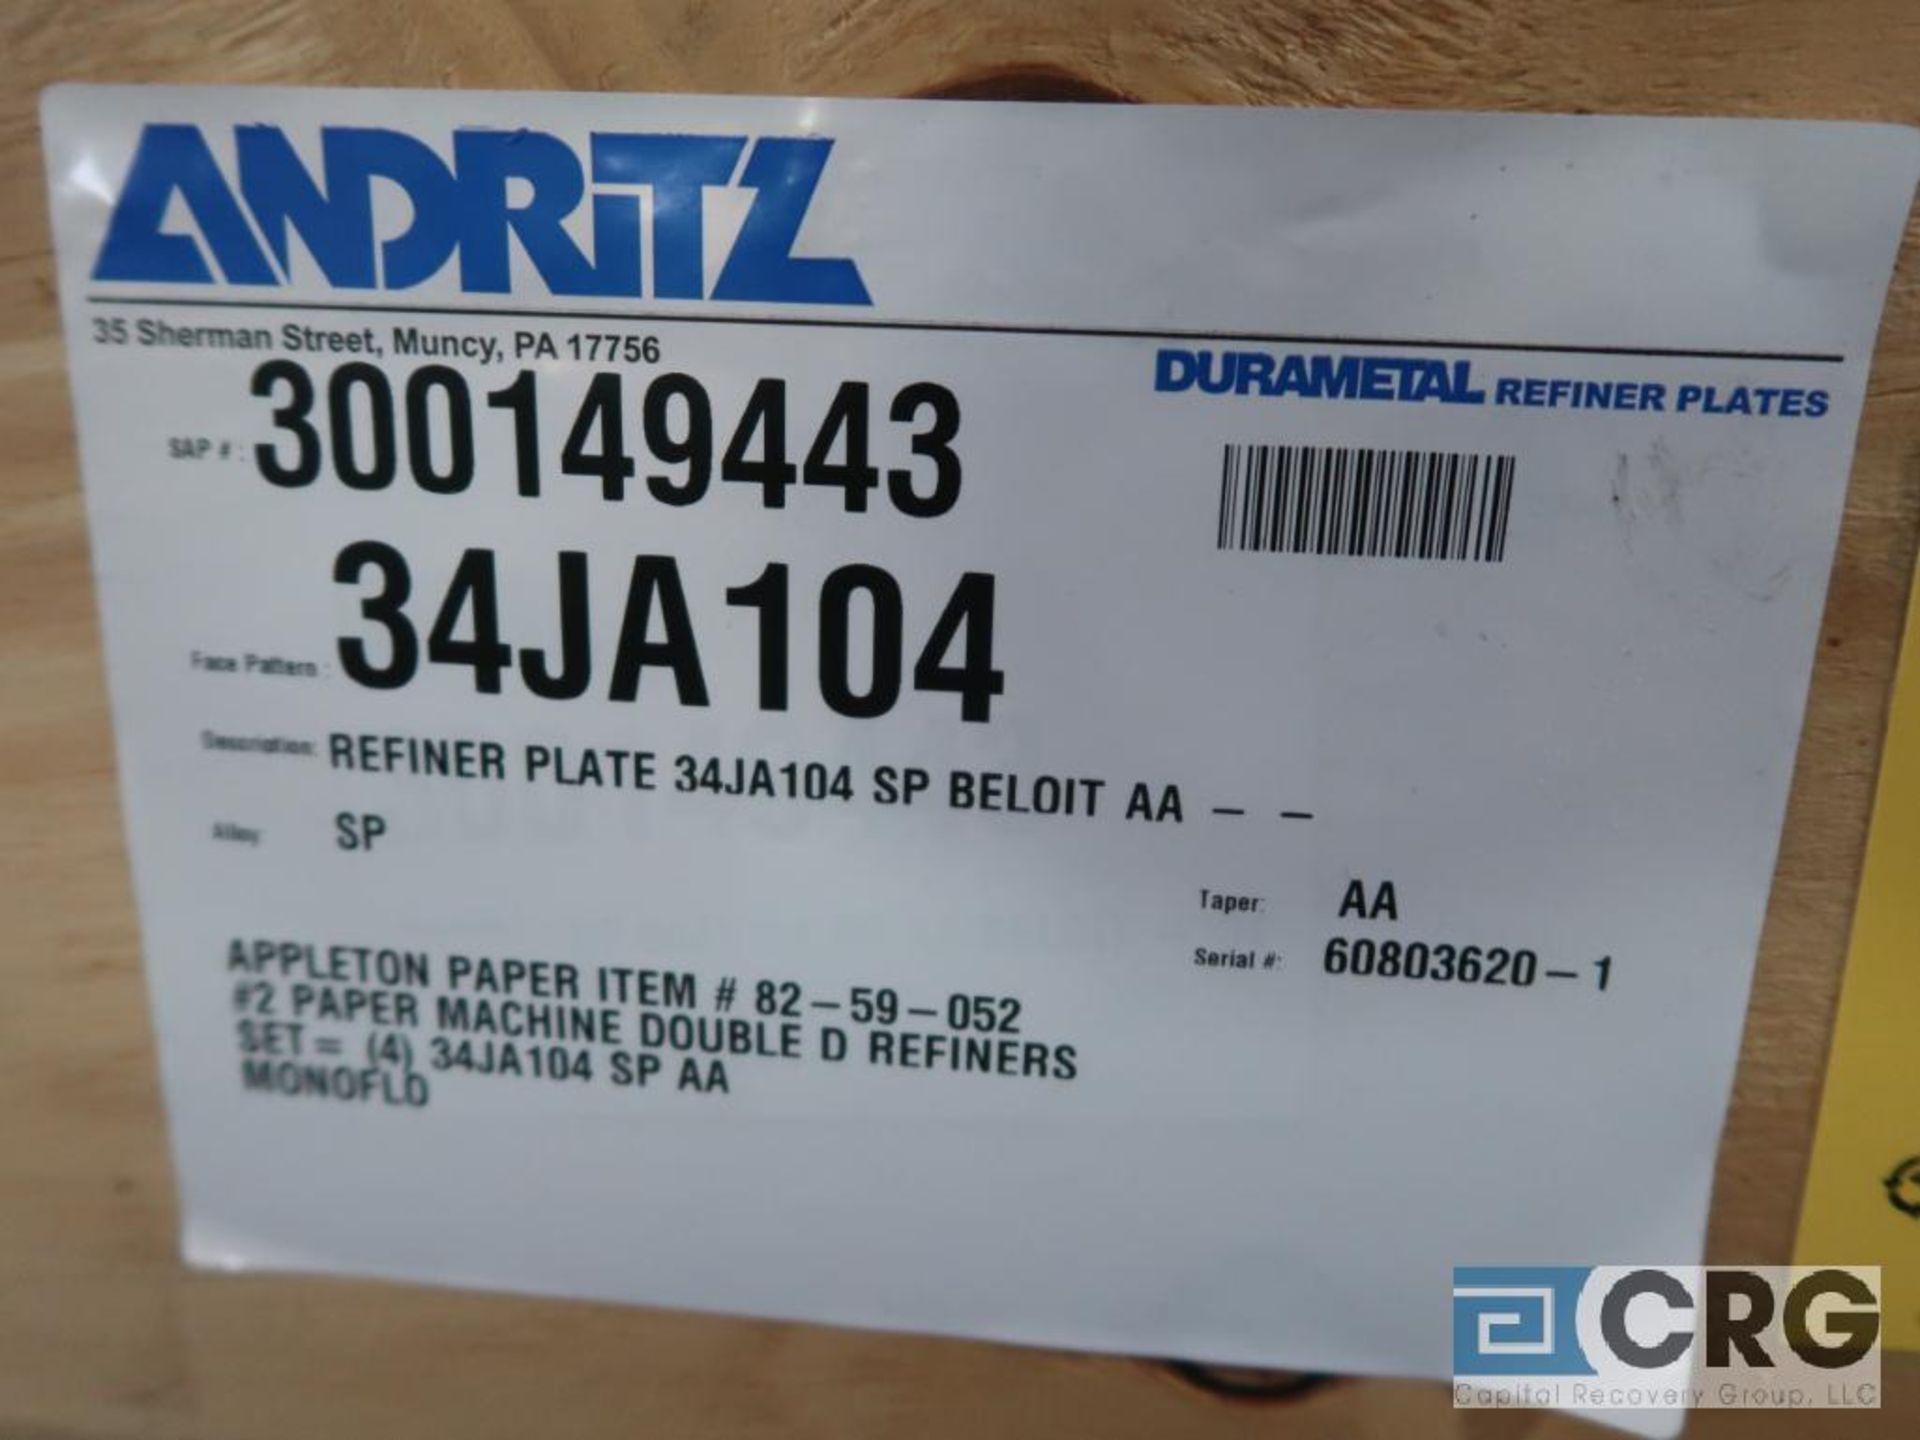 Lot of (8) Andritz 34JA104 refiner plates (Finish Building) - Image 3 of 3